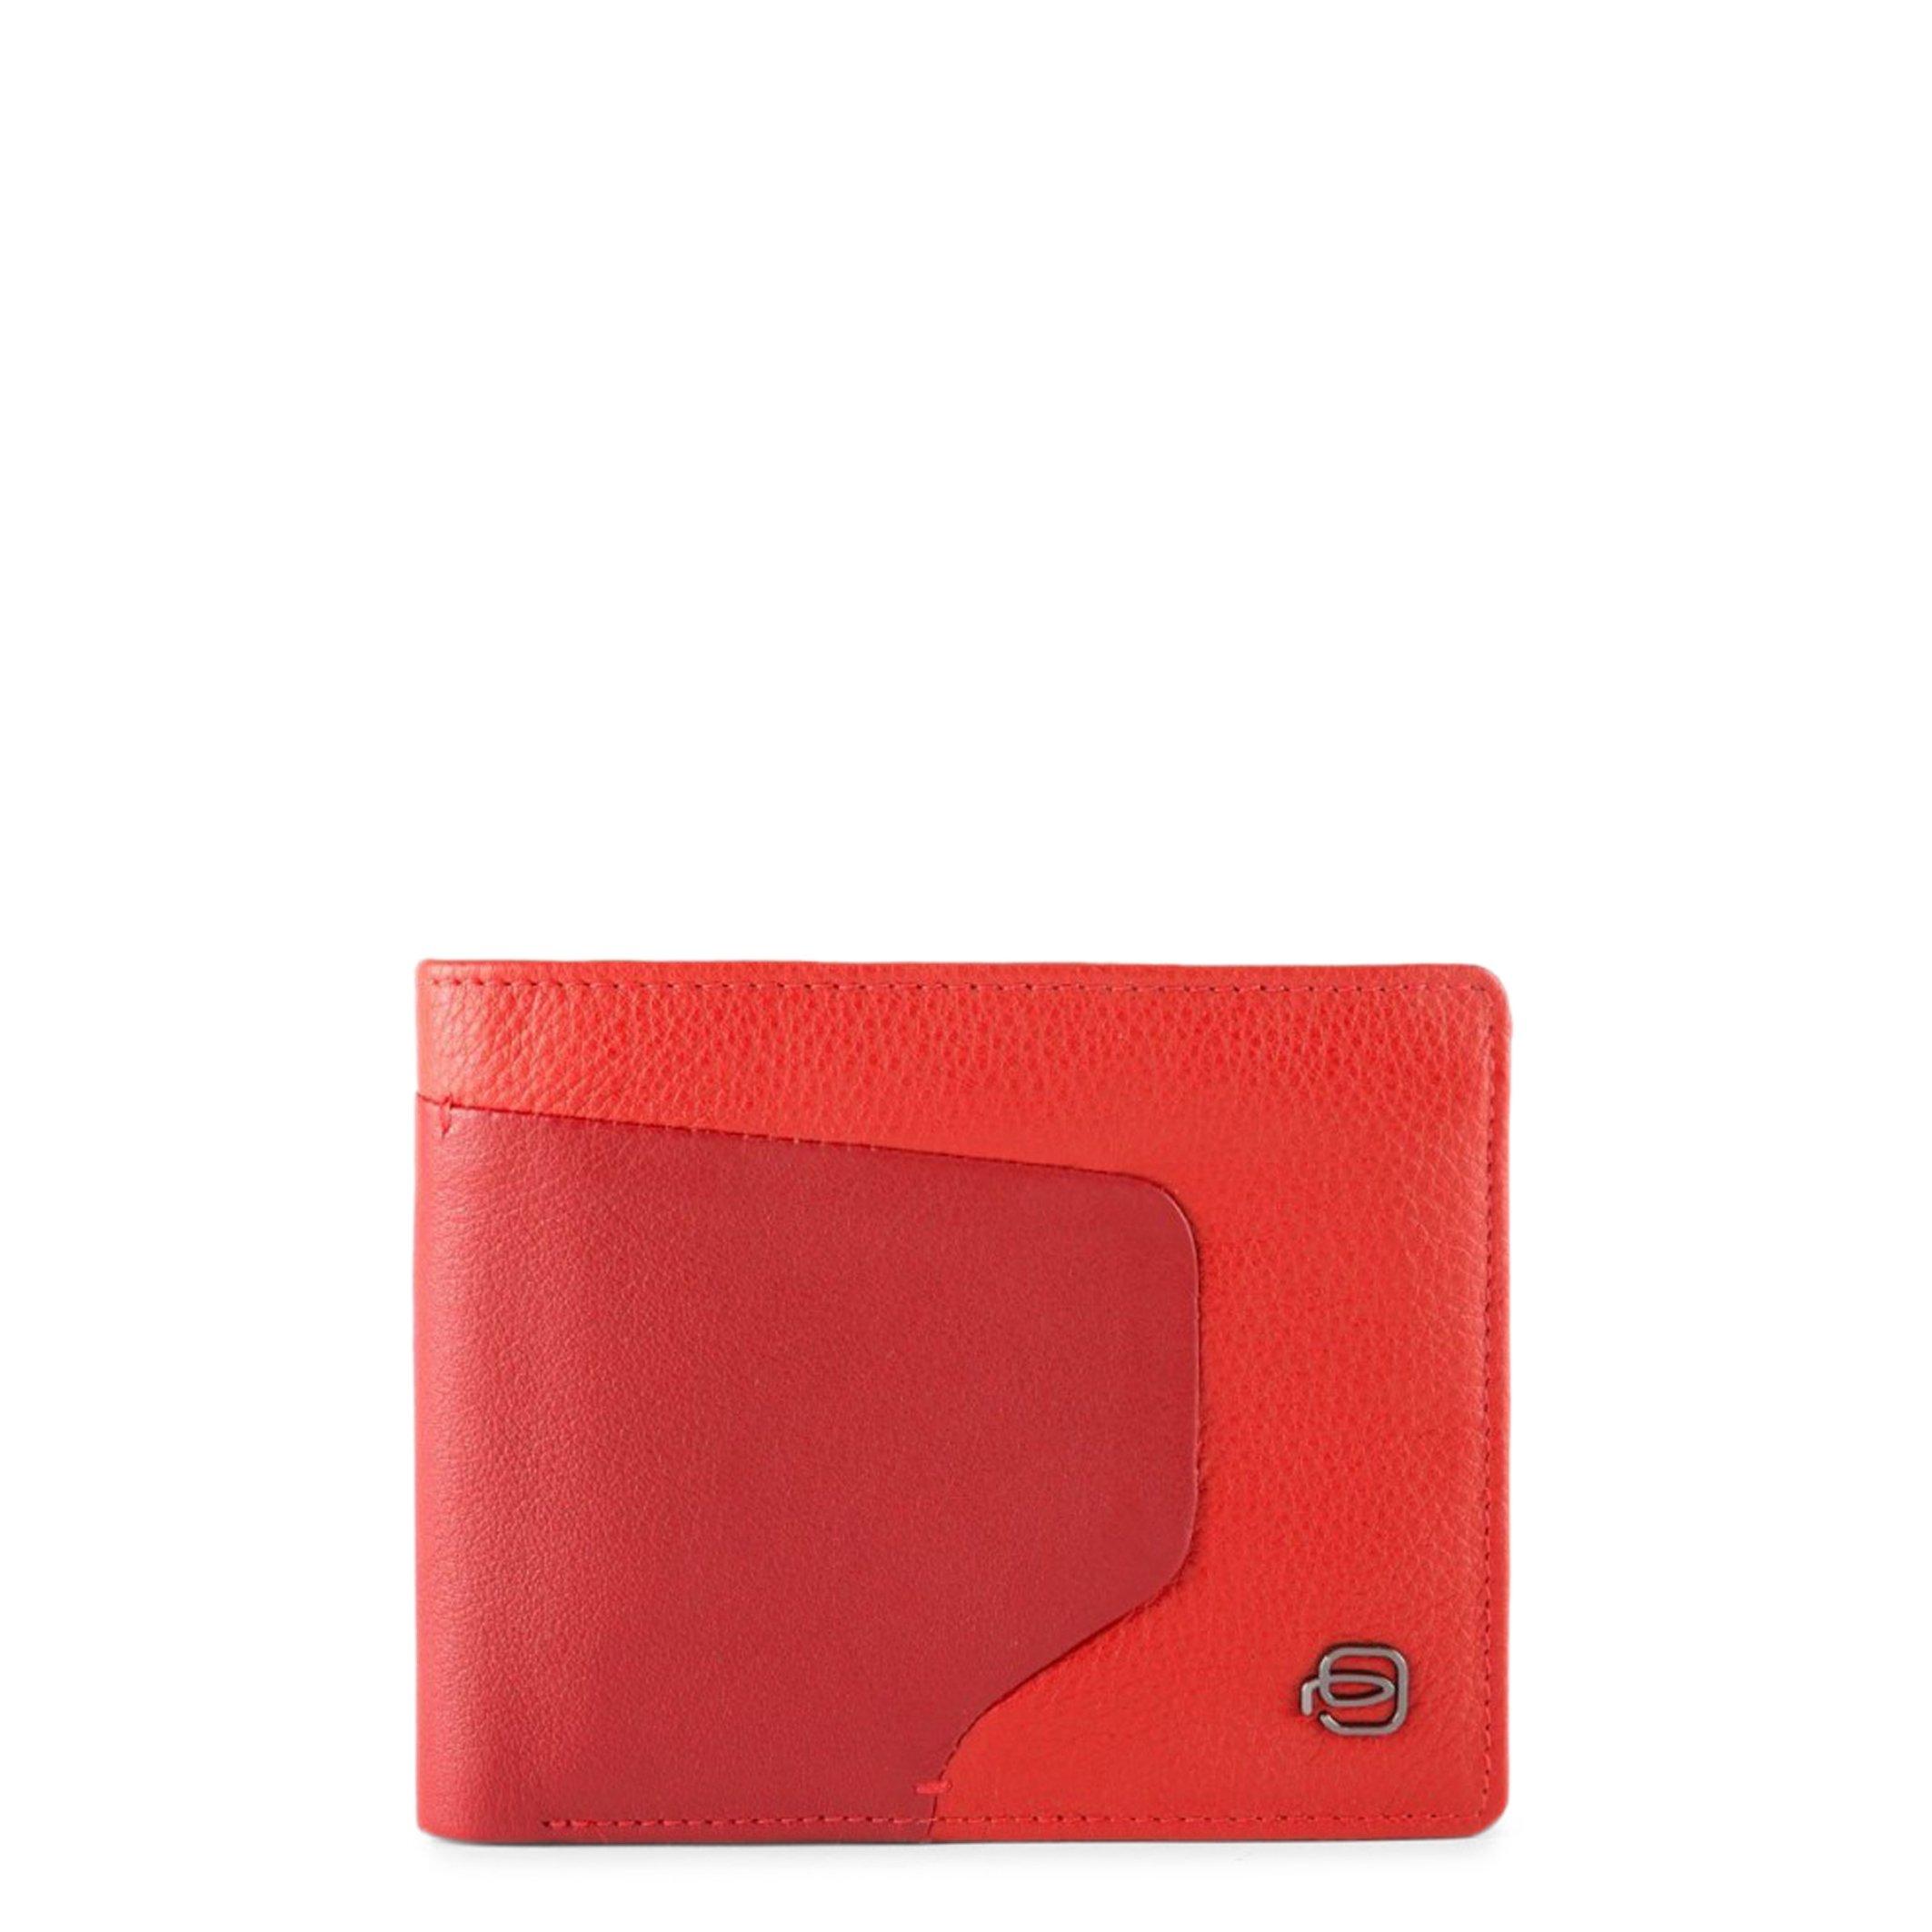 Piquadro Men's Wallet Various Colours PU4823AOR - red NOSIZE